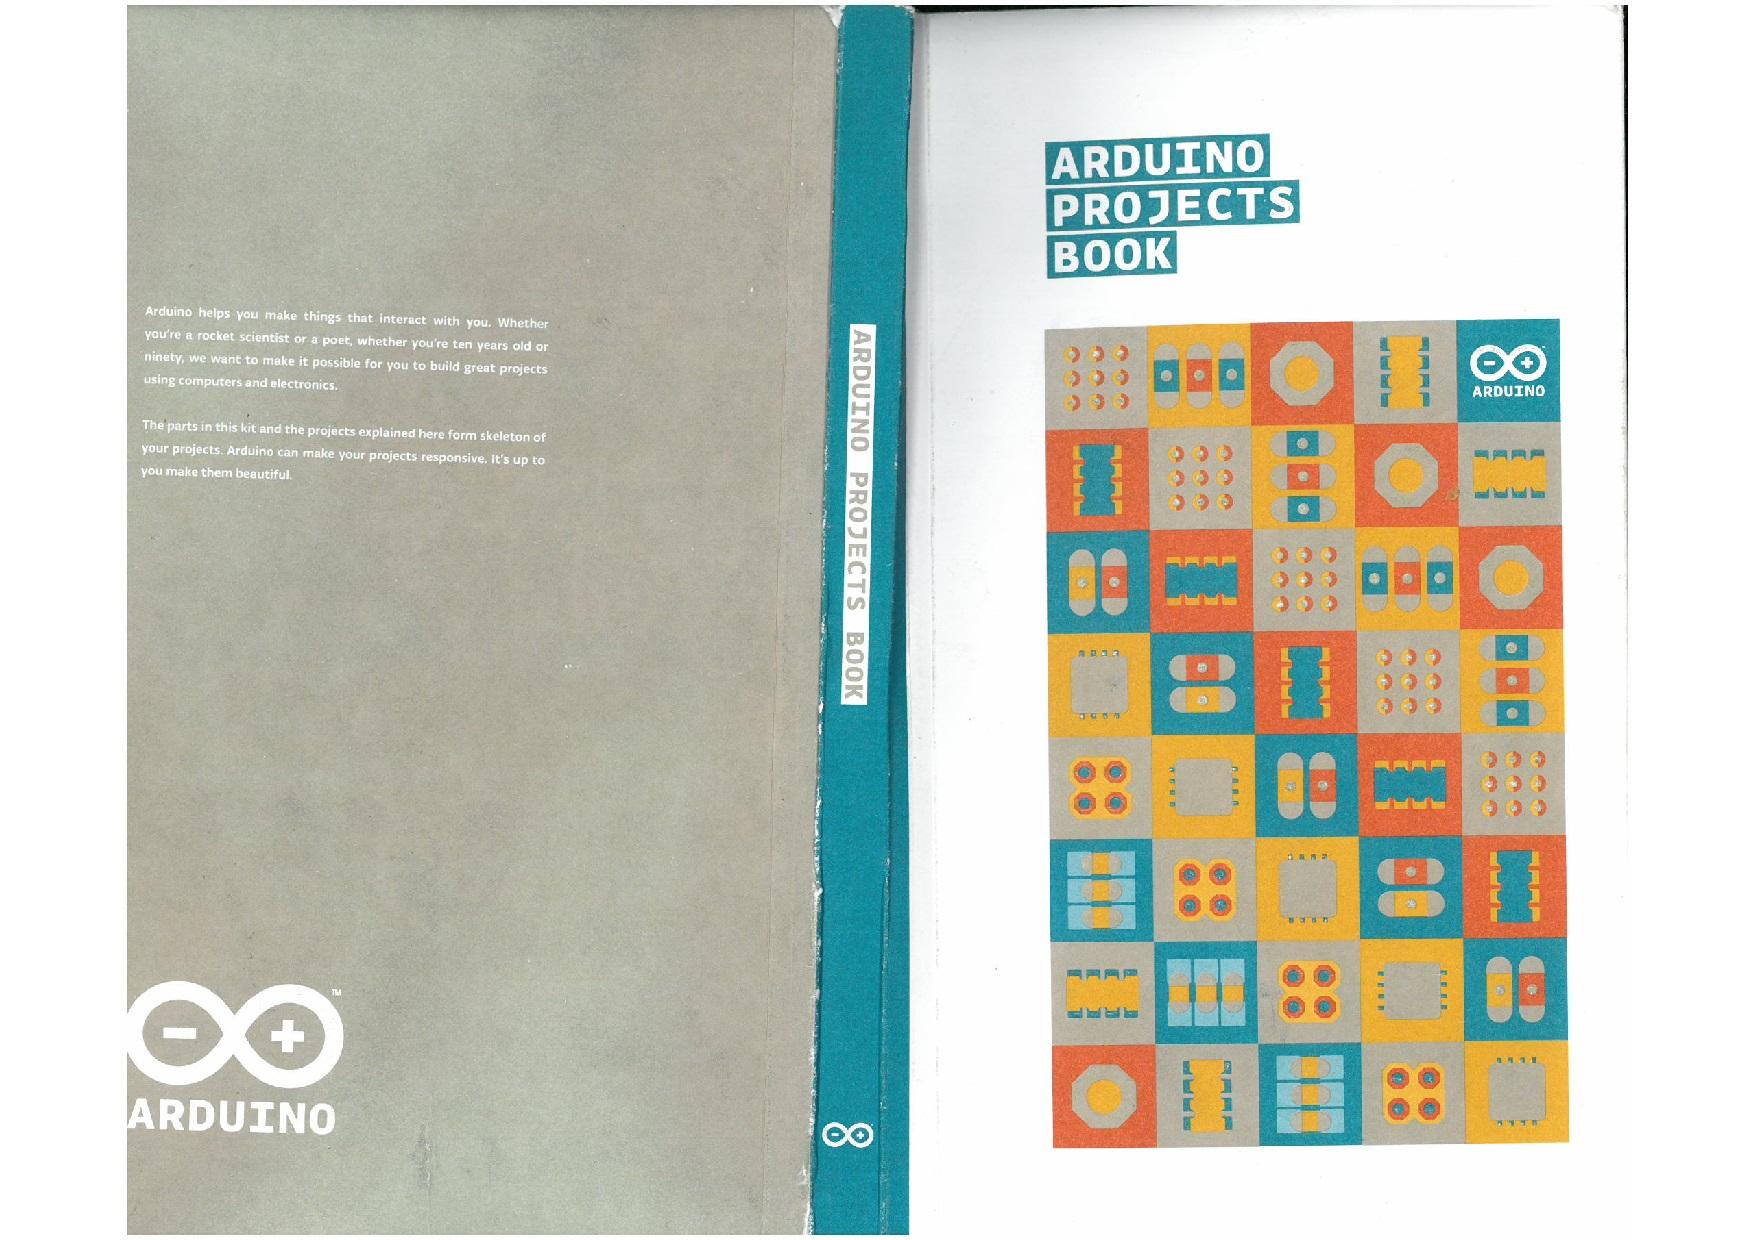 ArduinoBook_Portada